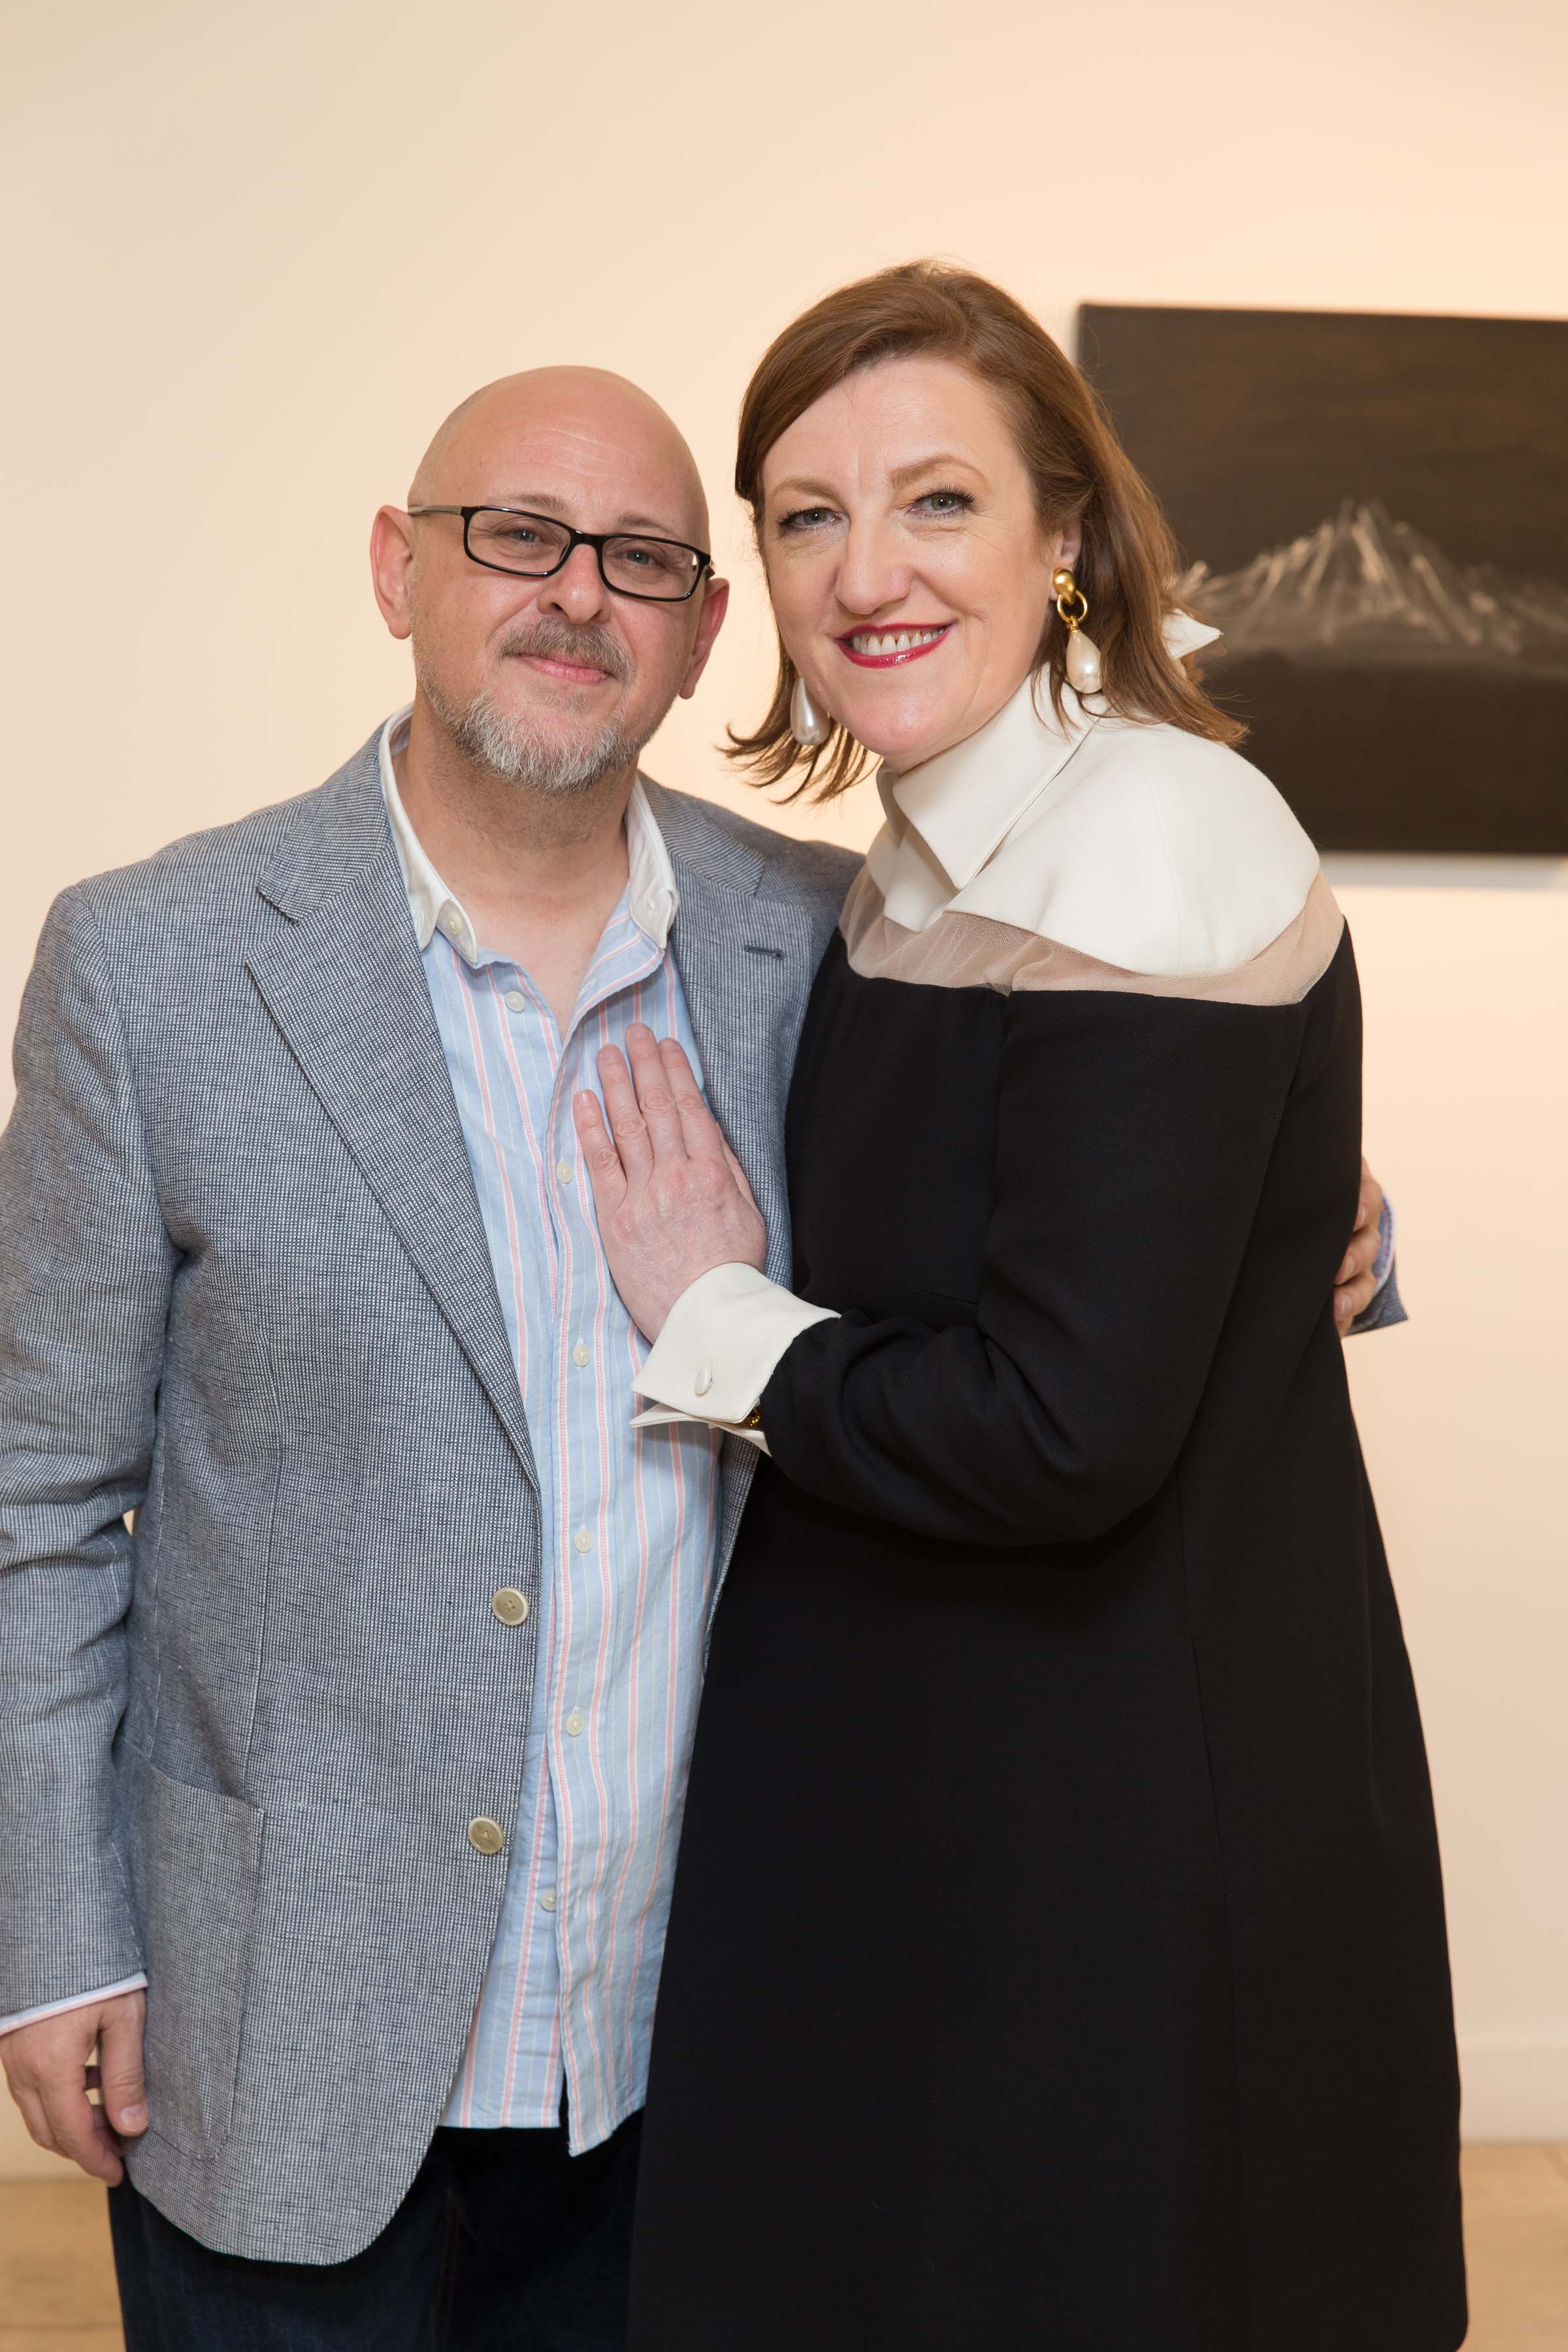 Serge Sorokko Gallery hosts cocktails to celebrate Tthe exhibit opening of Stephen Sumner's FIELD RECORDINGS